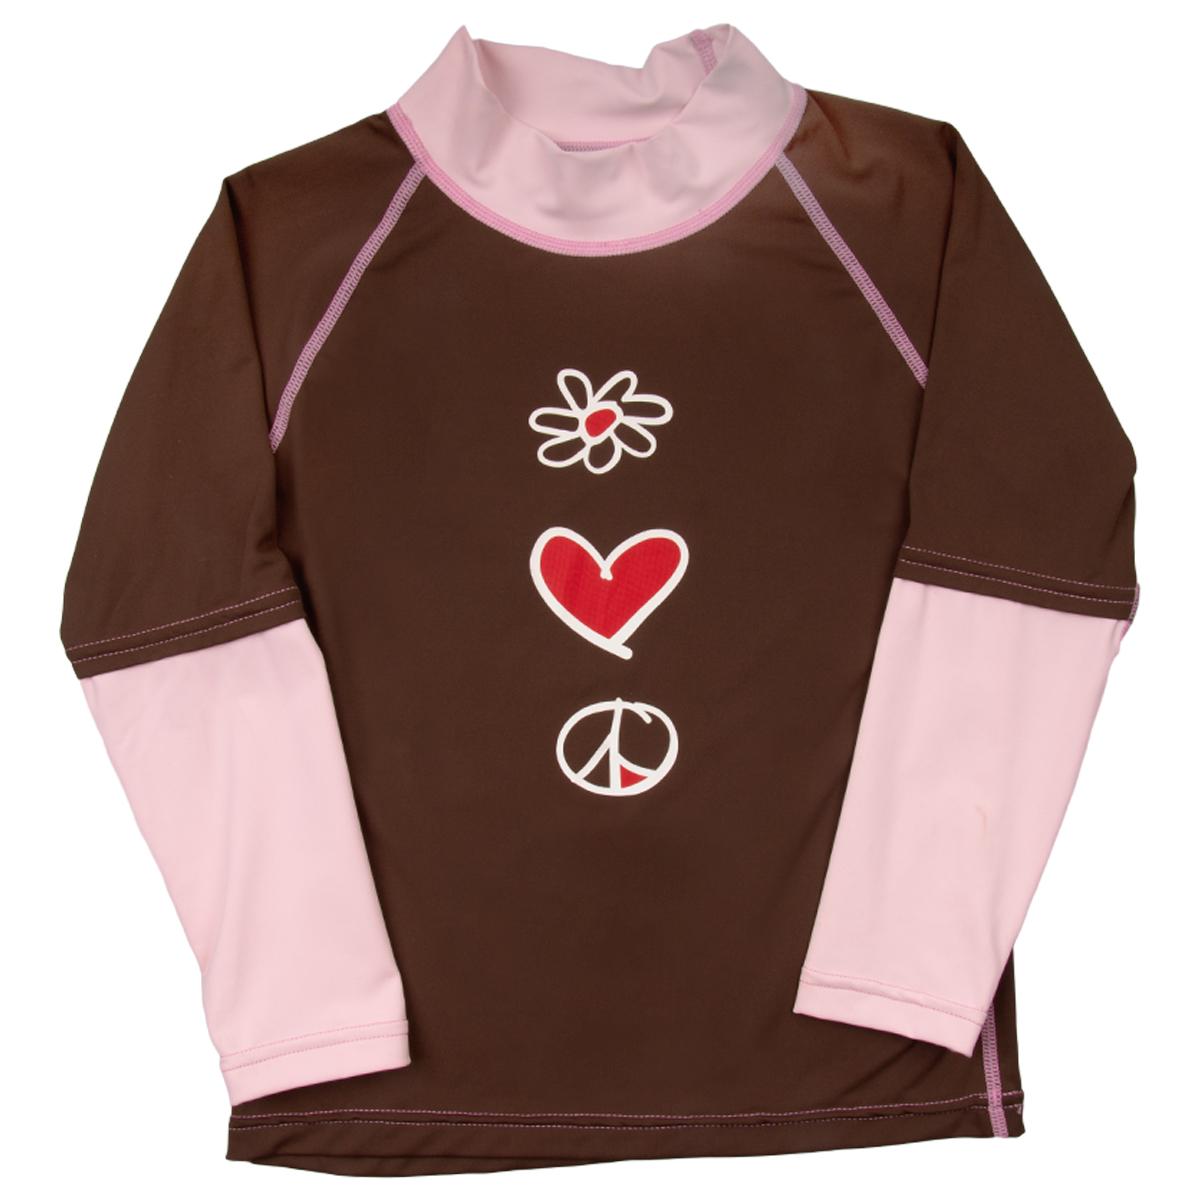 Sunskinz kid rash guard uv protective long sleeve upf 50 for Uv shirts long sleeve